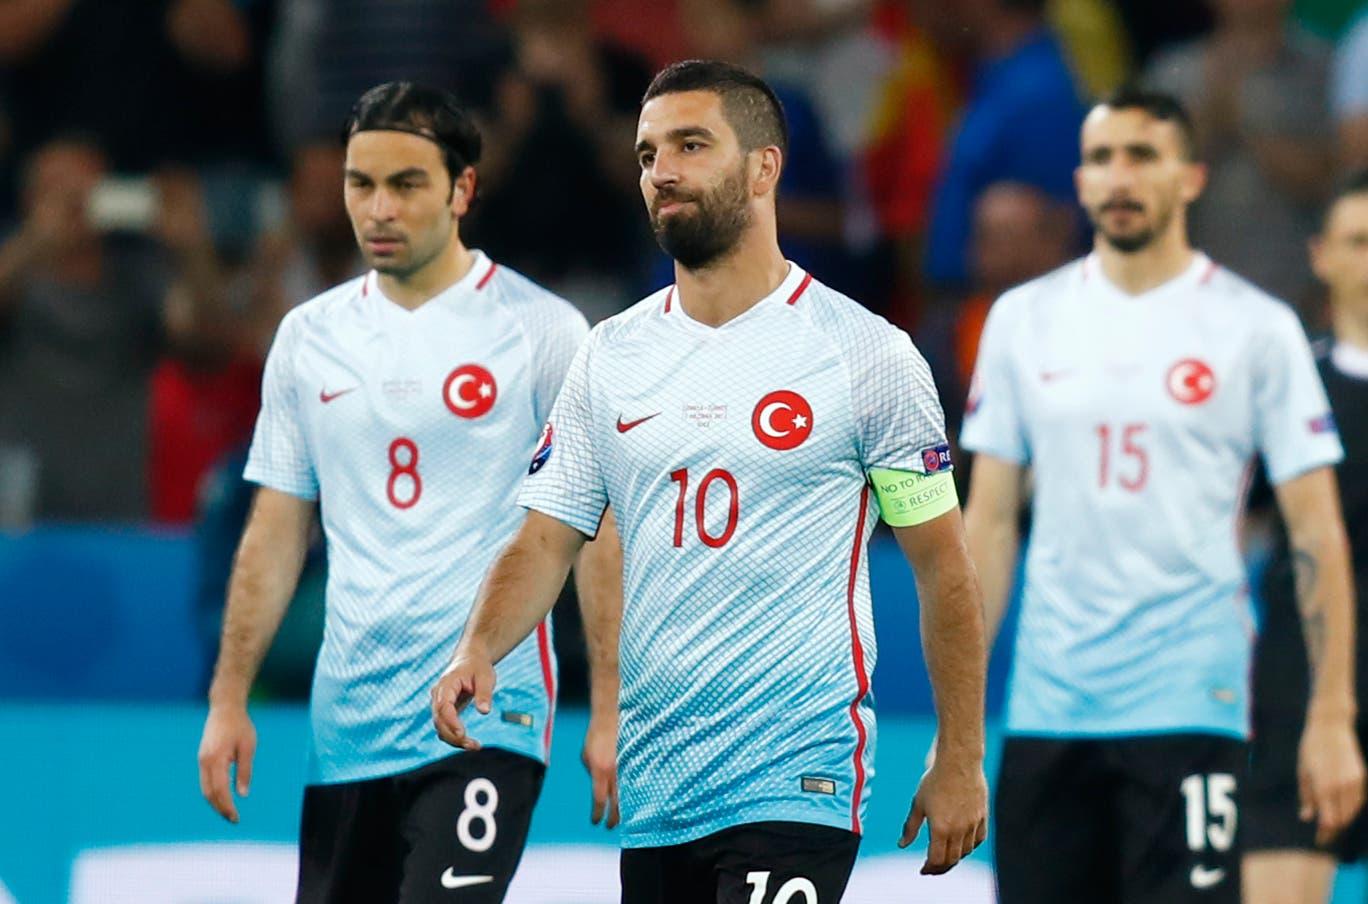 Turkey's Arda Turan reacts after Spain's Alvaro Morata scored a goal. (Reuters)